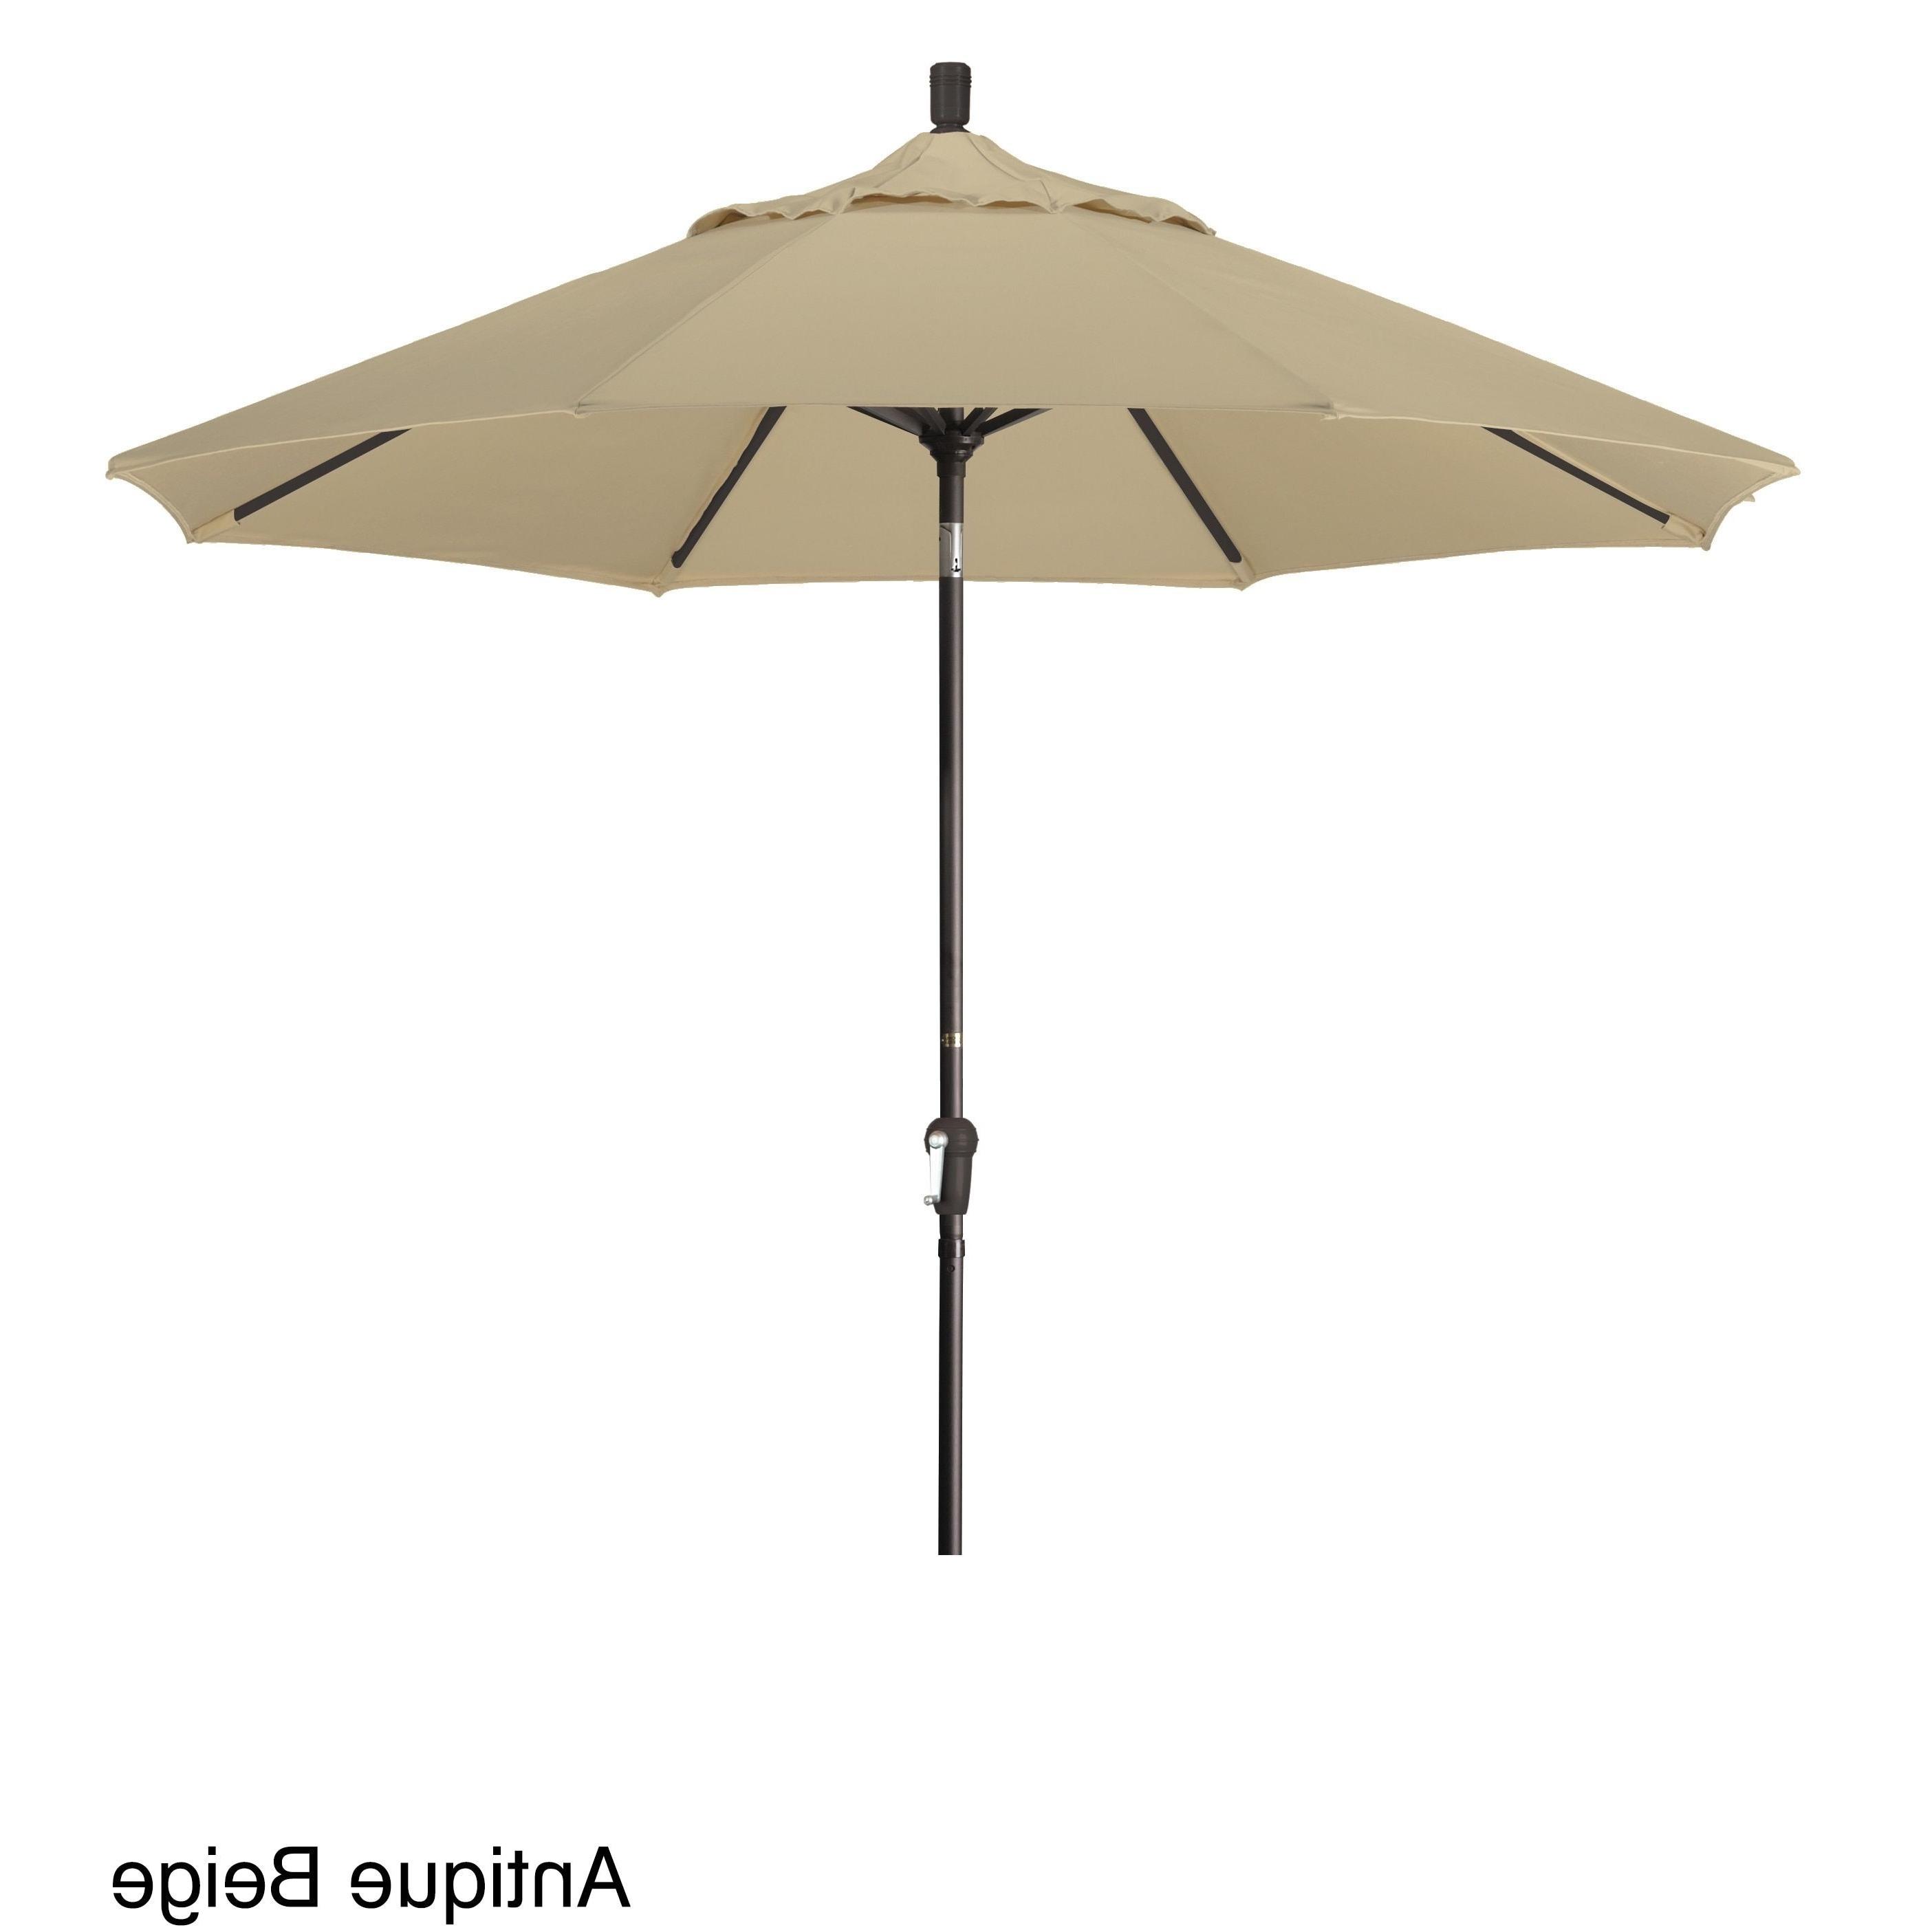 Sunbrella Teak Umbrellas Inside Most Current California Umbrella 9' Round Aluminum Crank Open Auto Tlit Market (View 12 of 20)